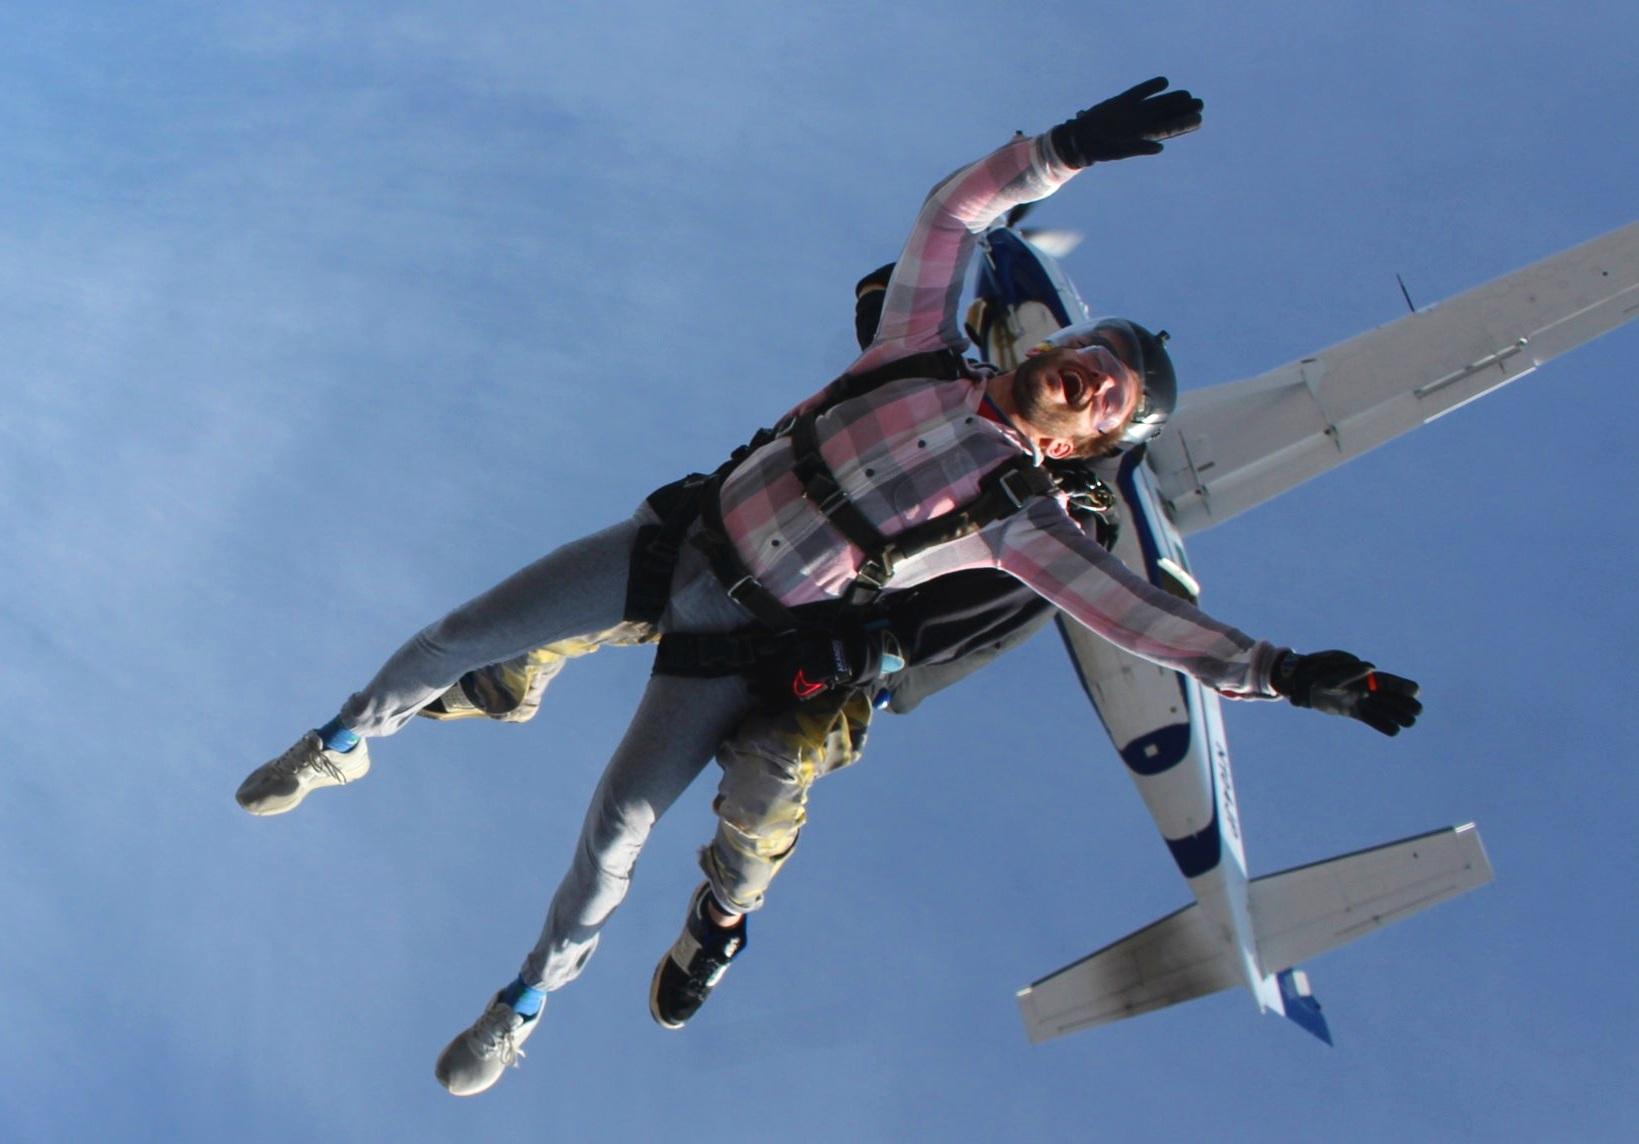 skydive_cross_keys_tandem_freefall